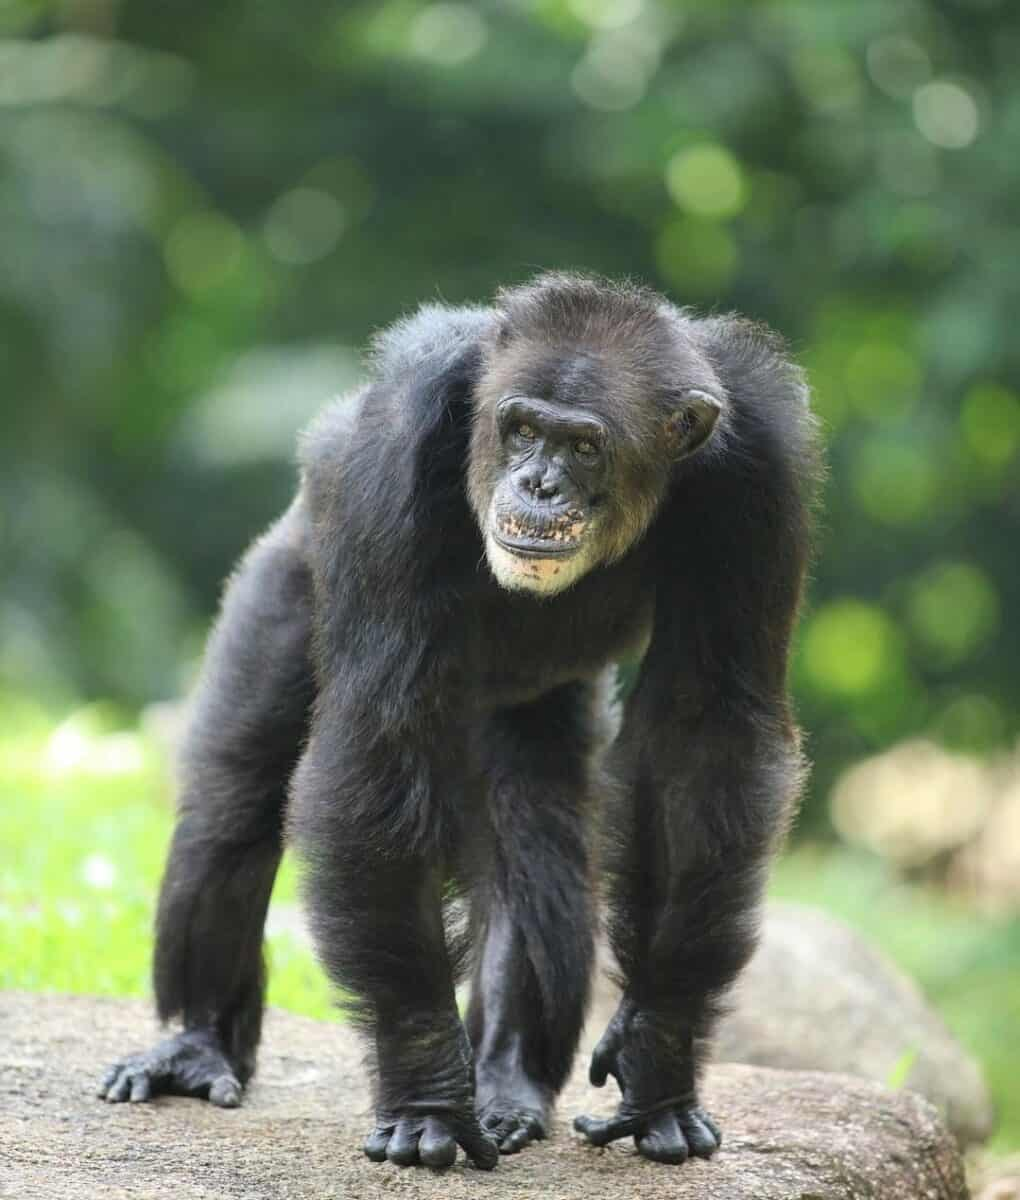 Chimpanzee monkey